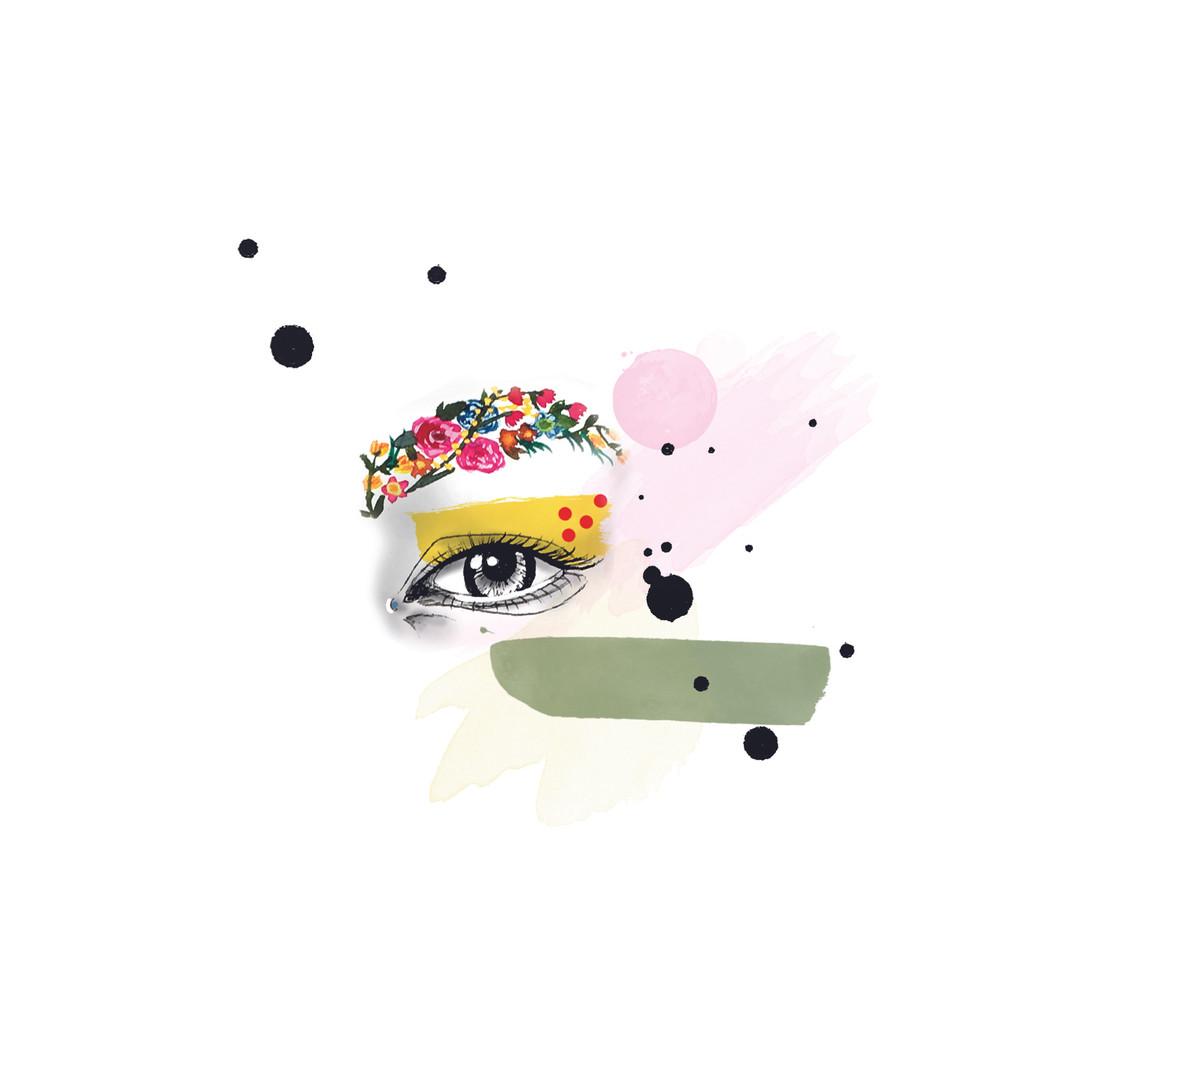 Watercolor + Digital Illustration